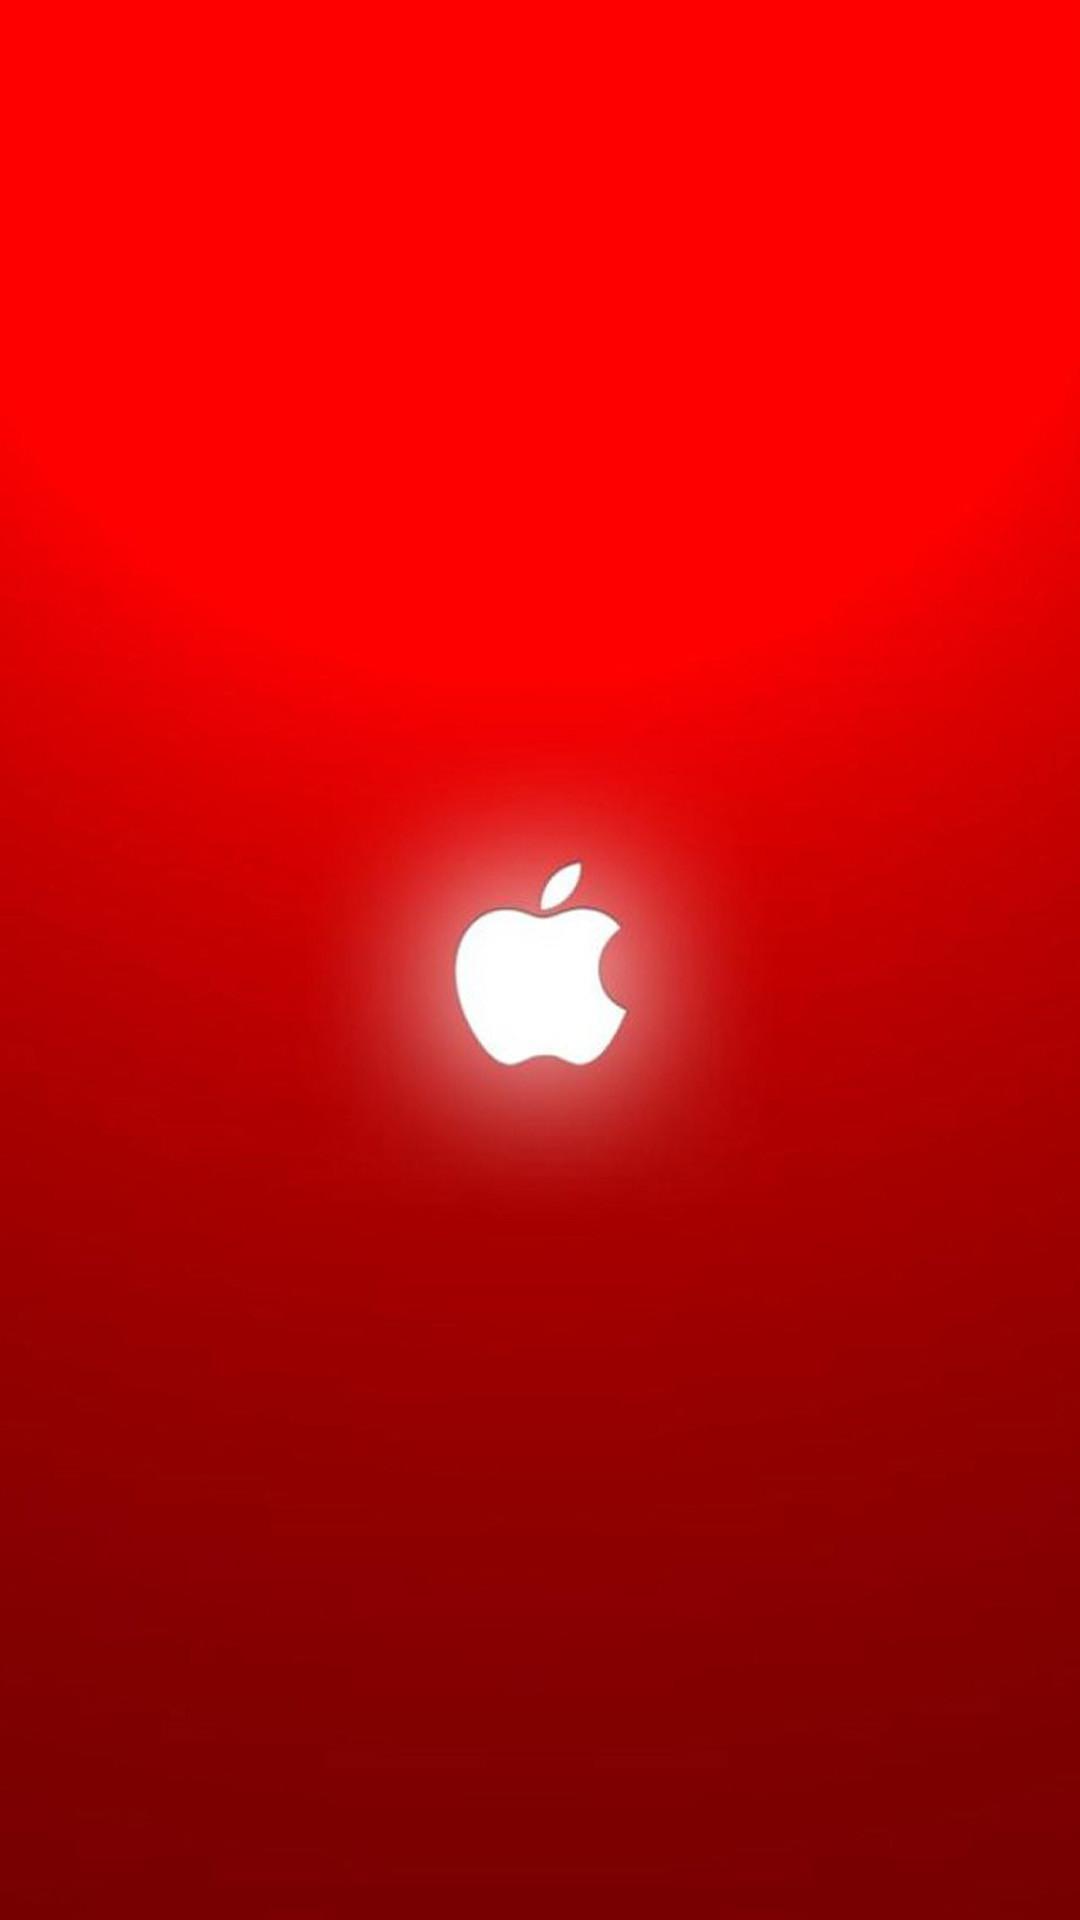 Apple Logo iPhone Wallpapers - Wallpaper Cave